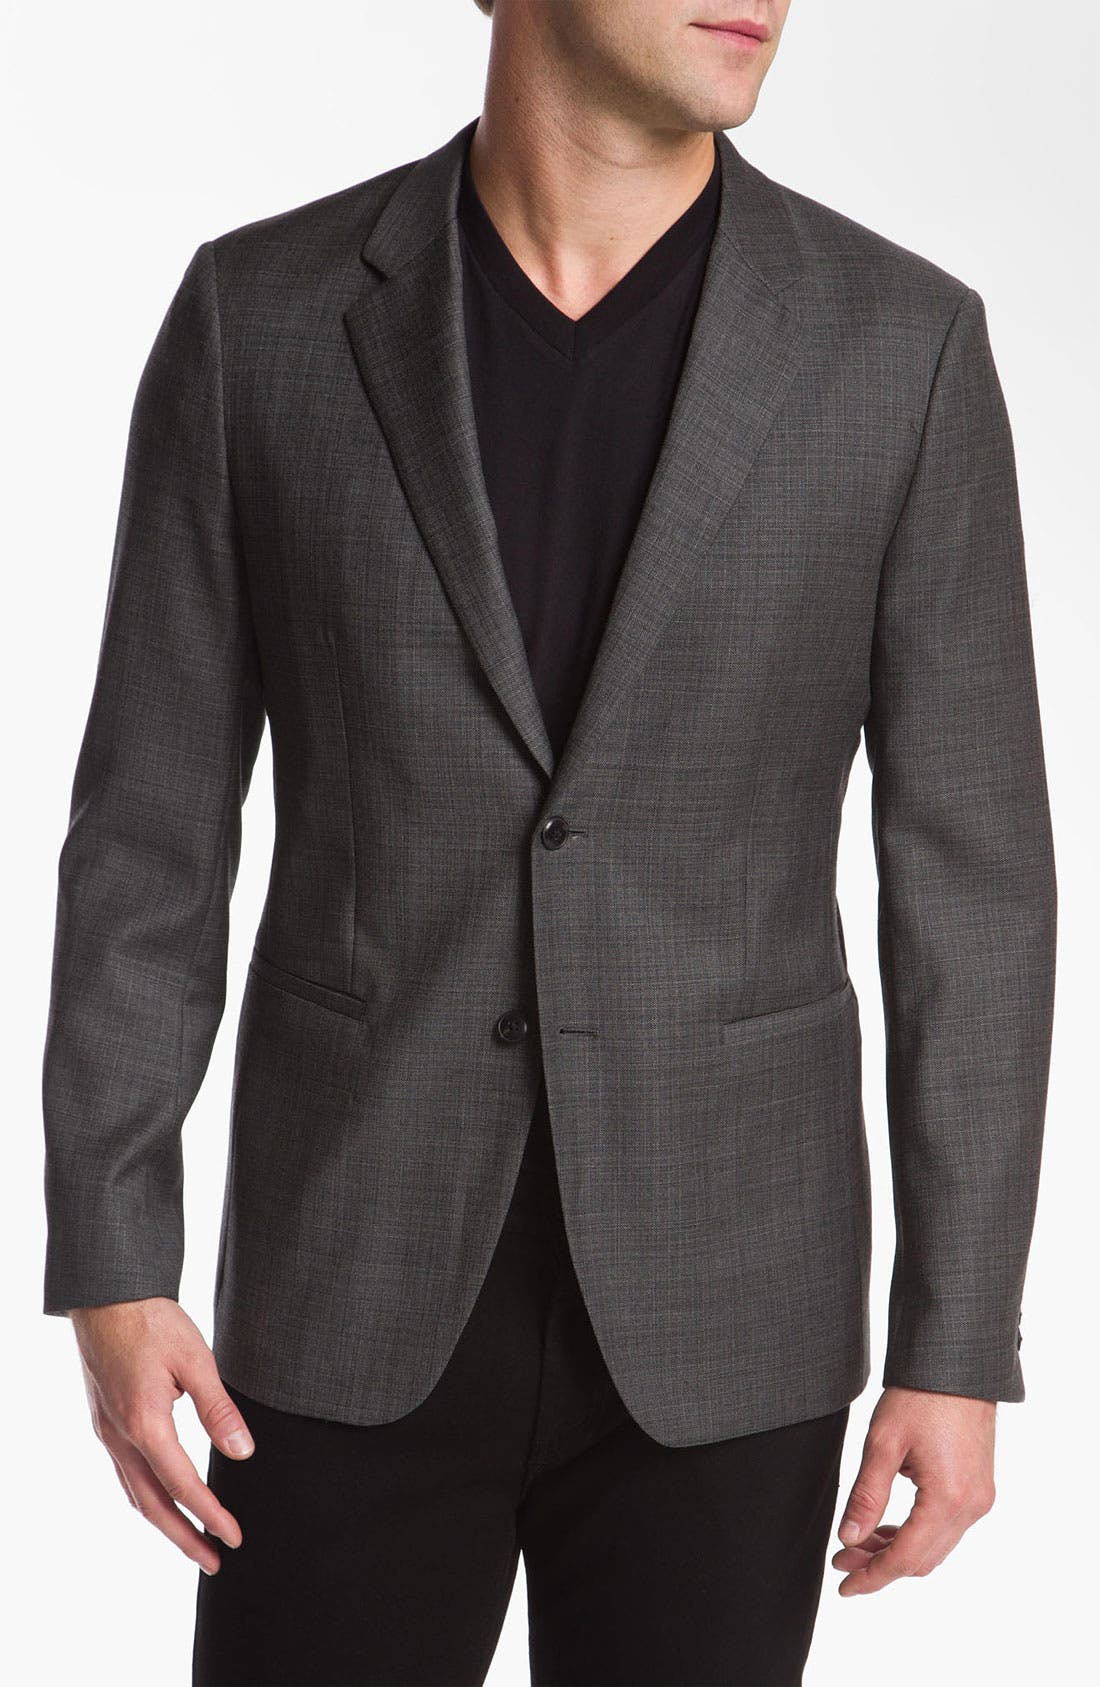 Alternate Image 1 Selected - Theory 'Kris LaJoux' Blazer